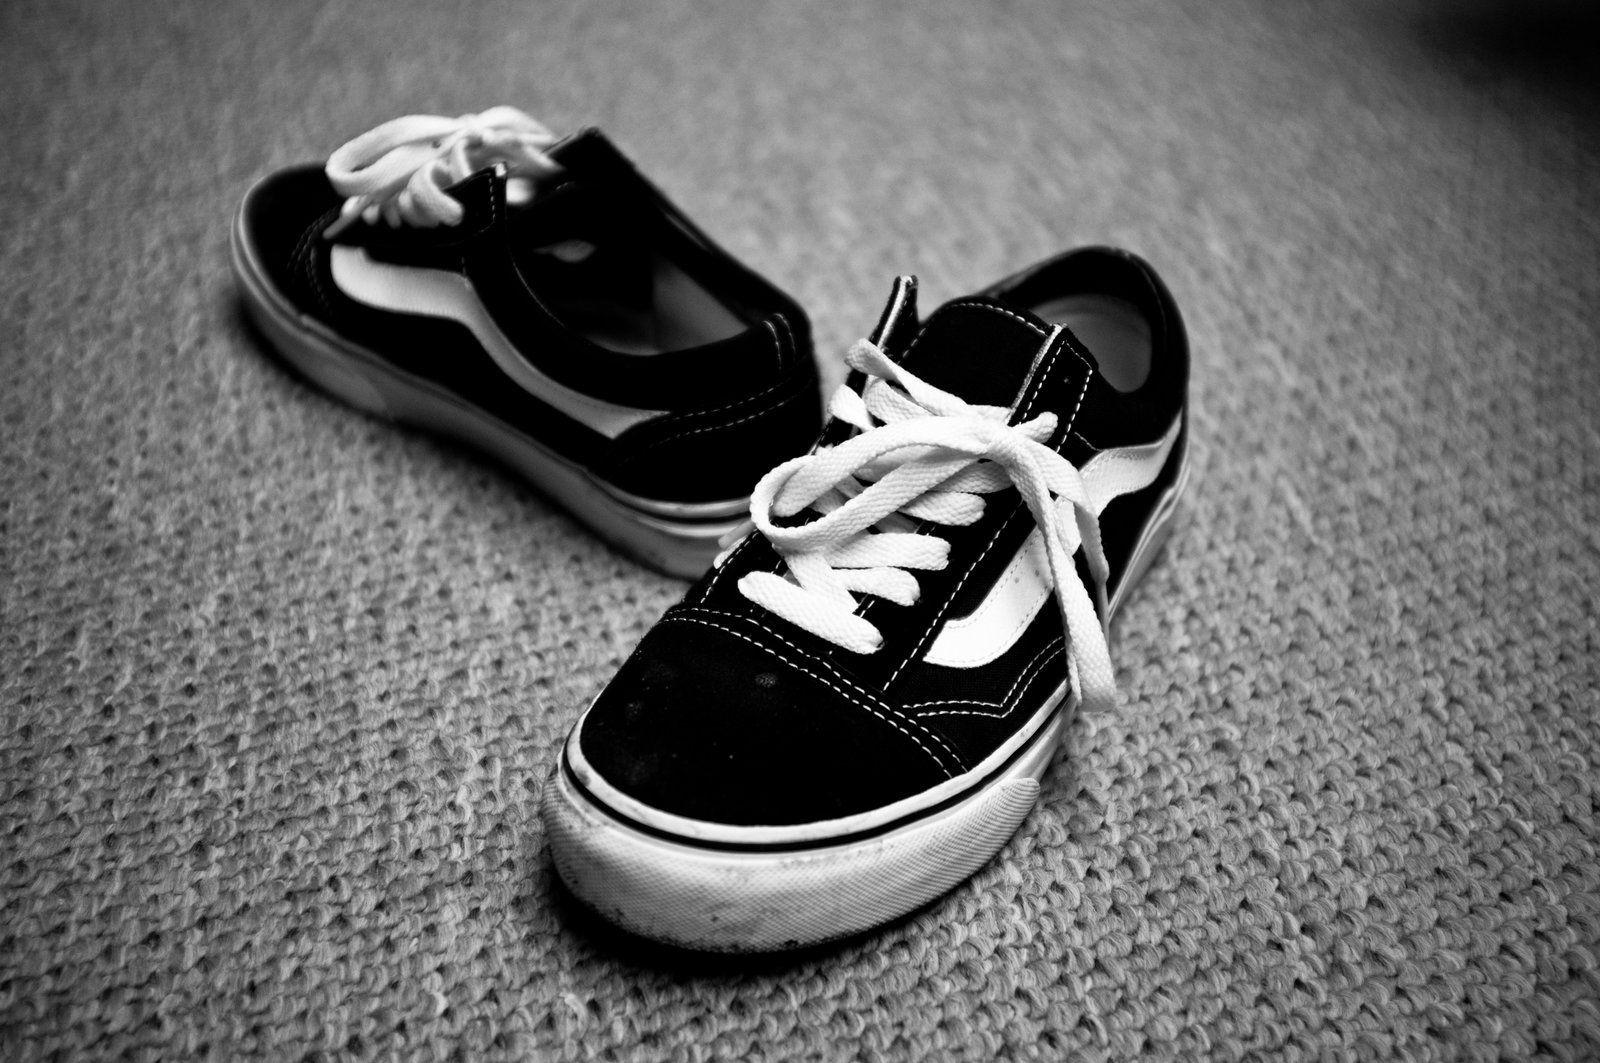 shoes wallpaper | wallpapers 4k | pinterest | wallpaper and